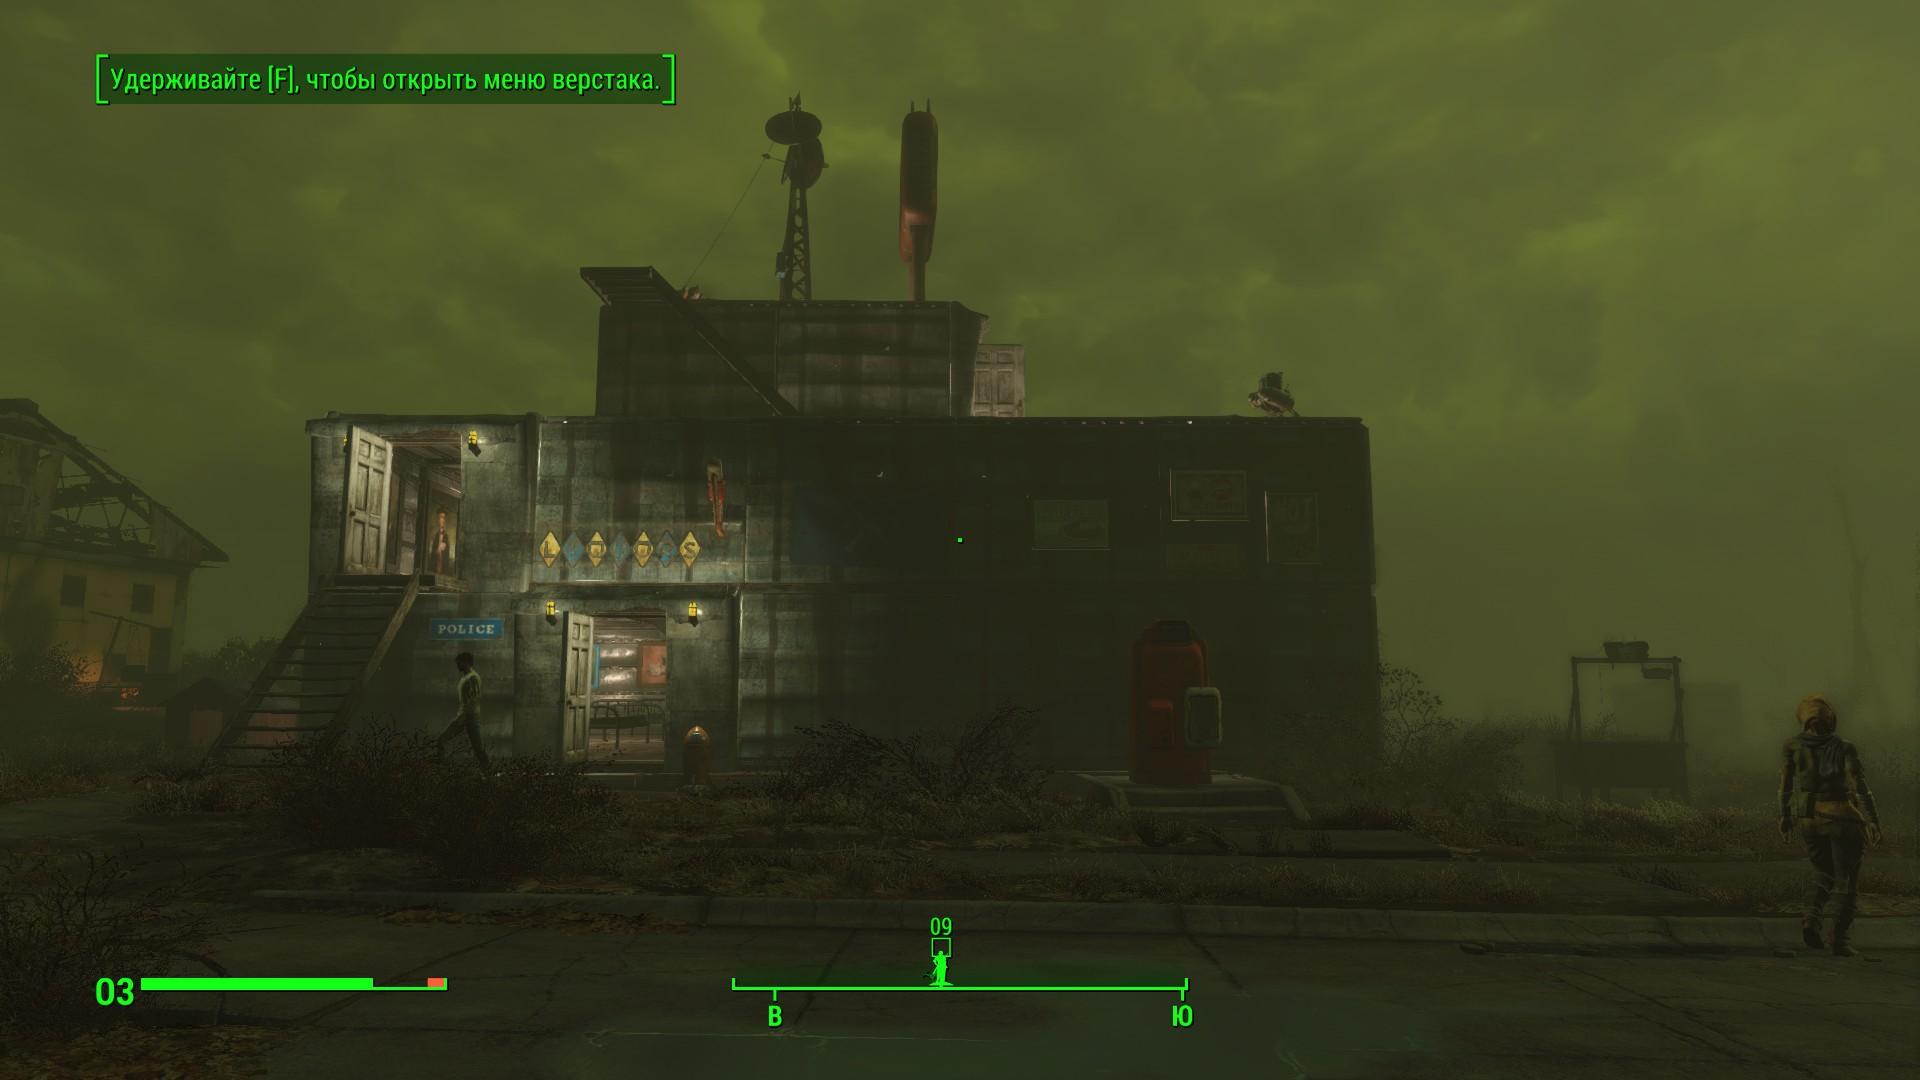 Fallout4_2017_06_20_23_10_55_911.jpg - Fallout 4